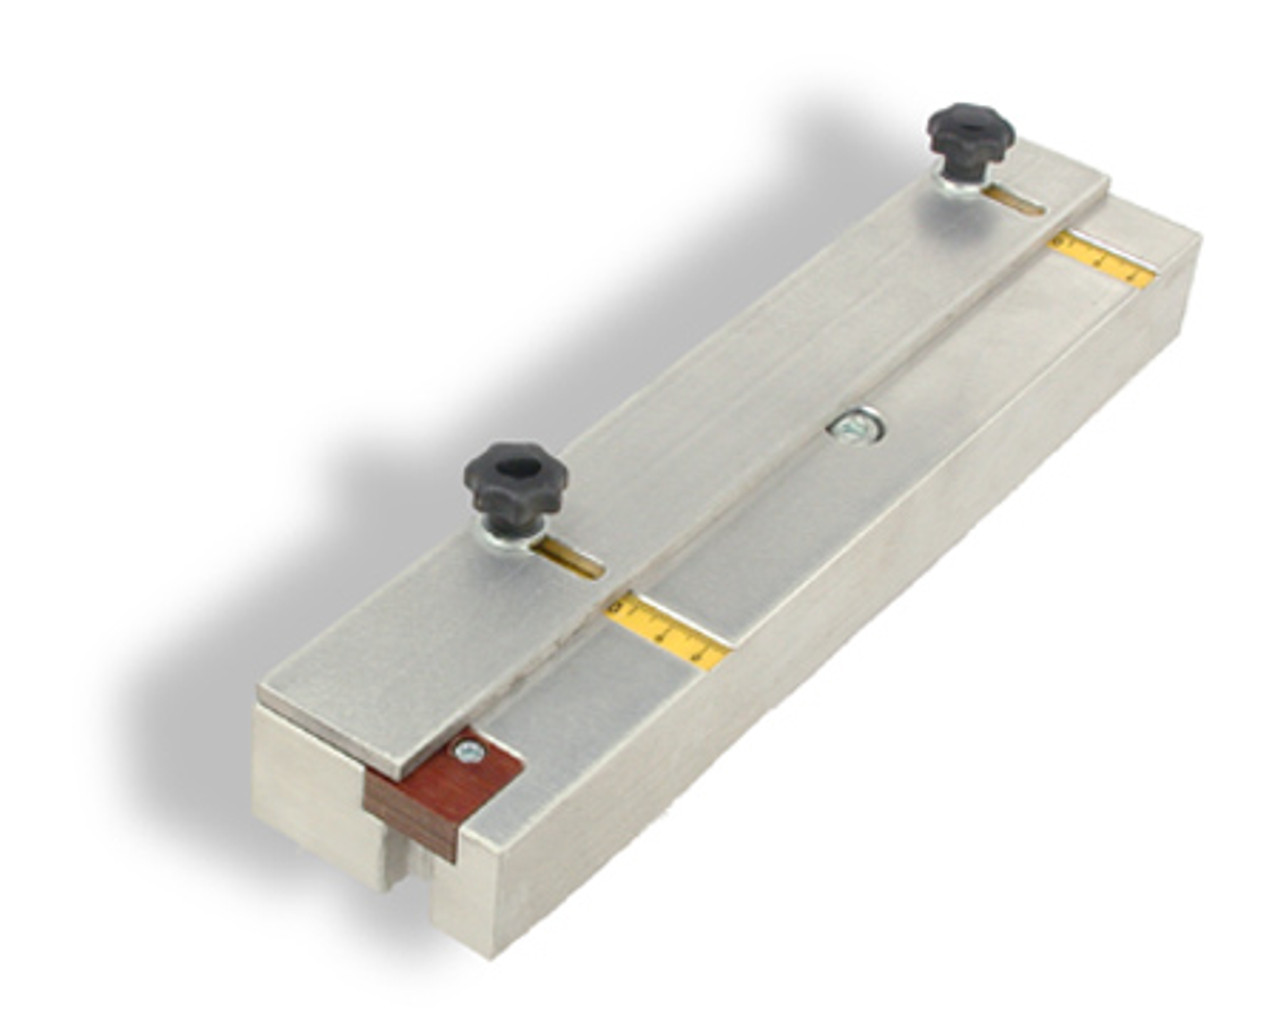 Mullion Jig for MU2 and MU2-P models (W3012000)